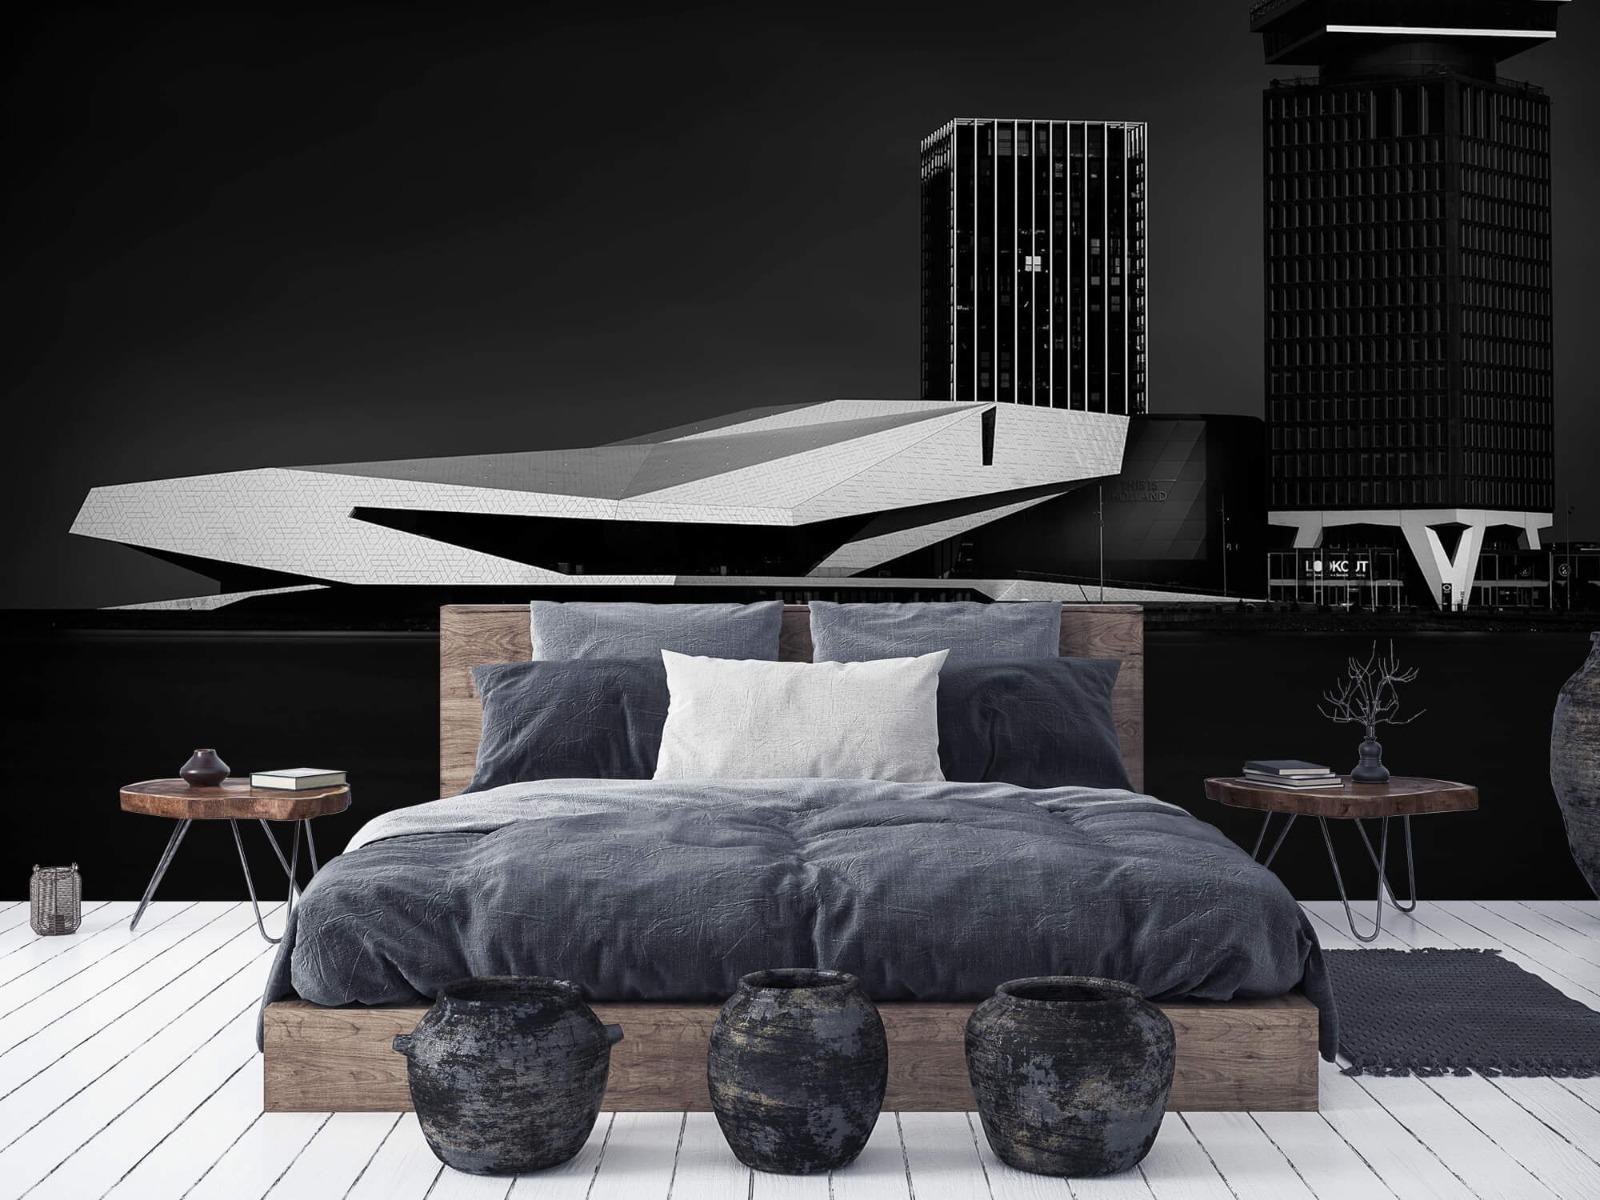 Modern behang - Gebouwen Amsterdam - Tienerkamer 6